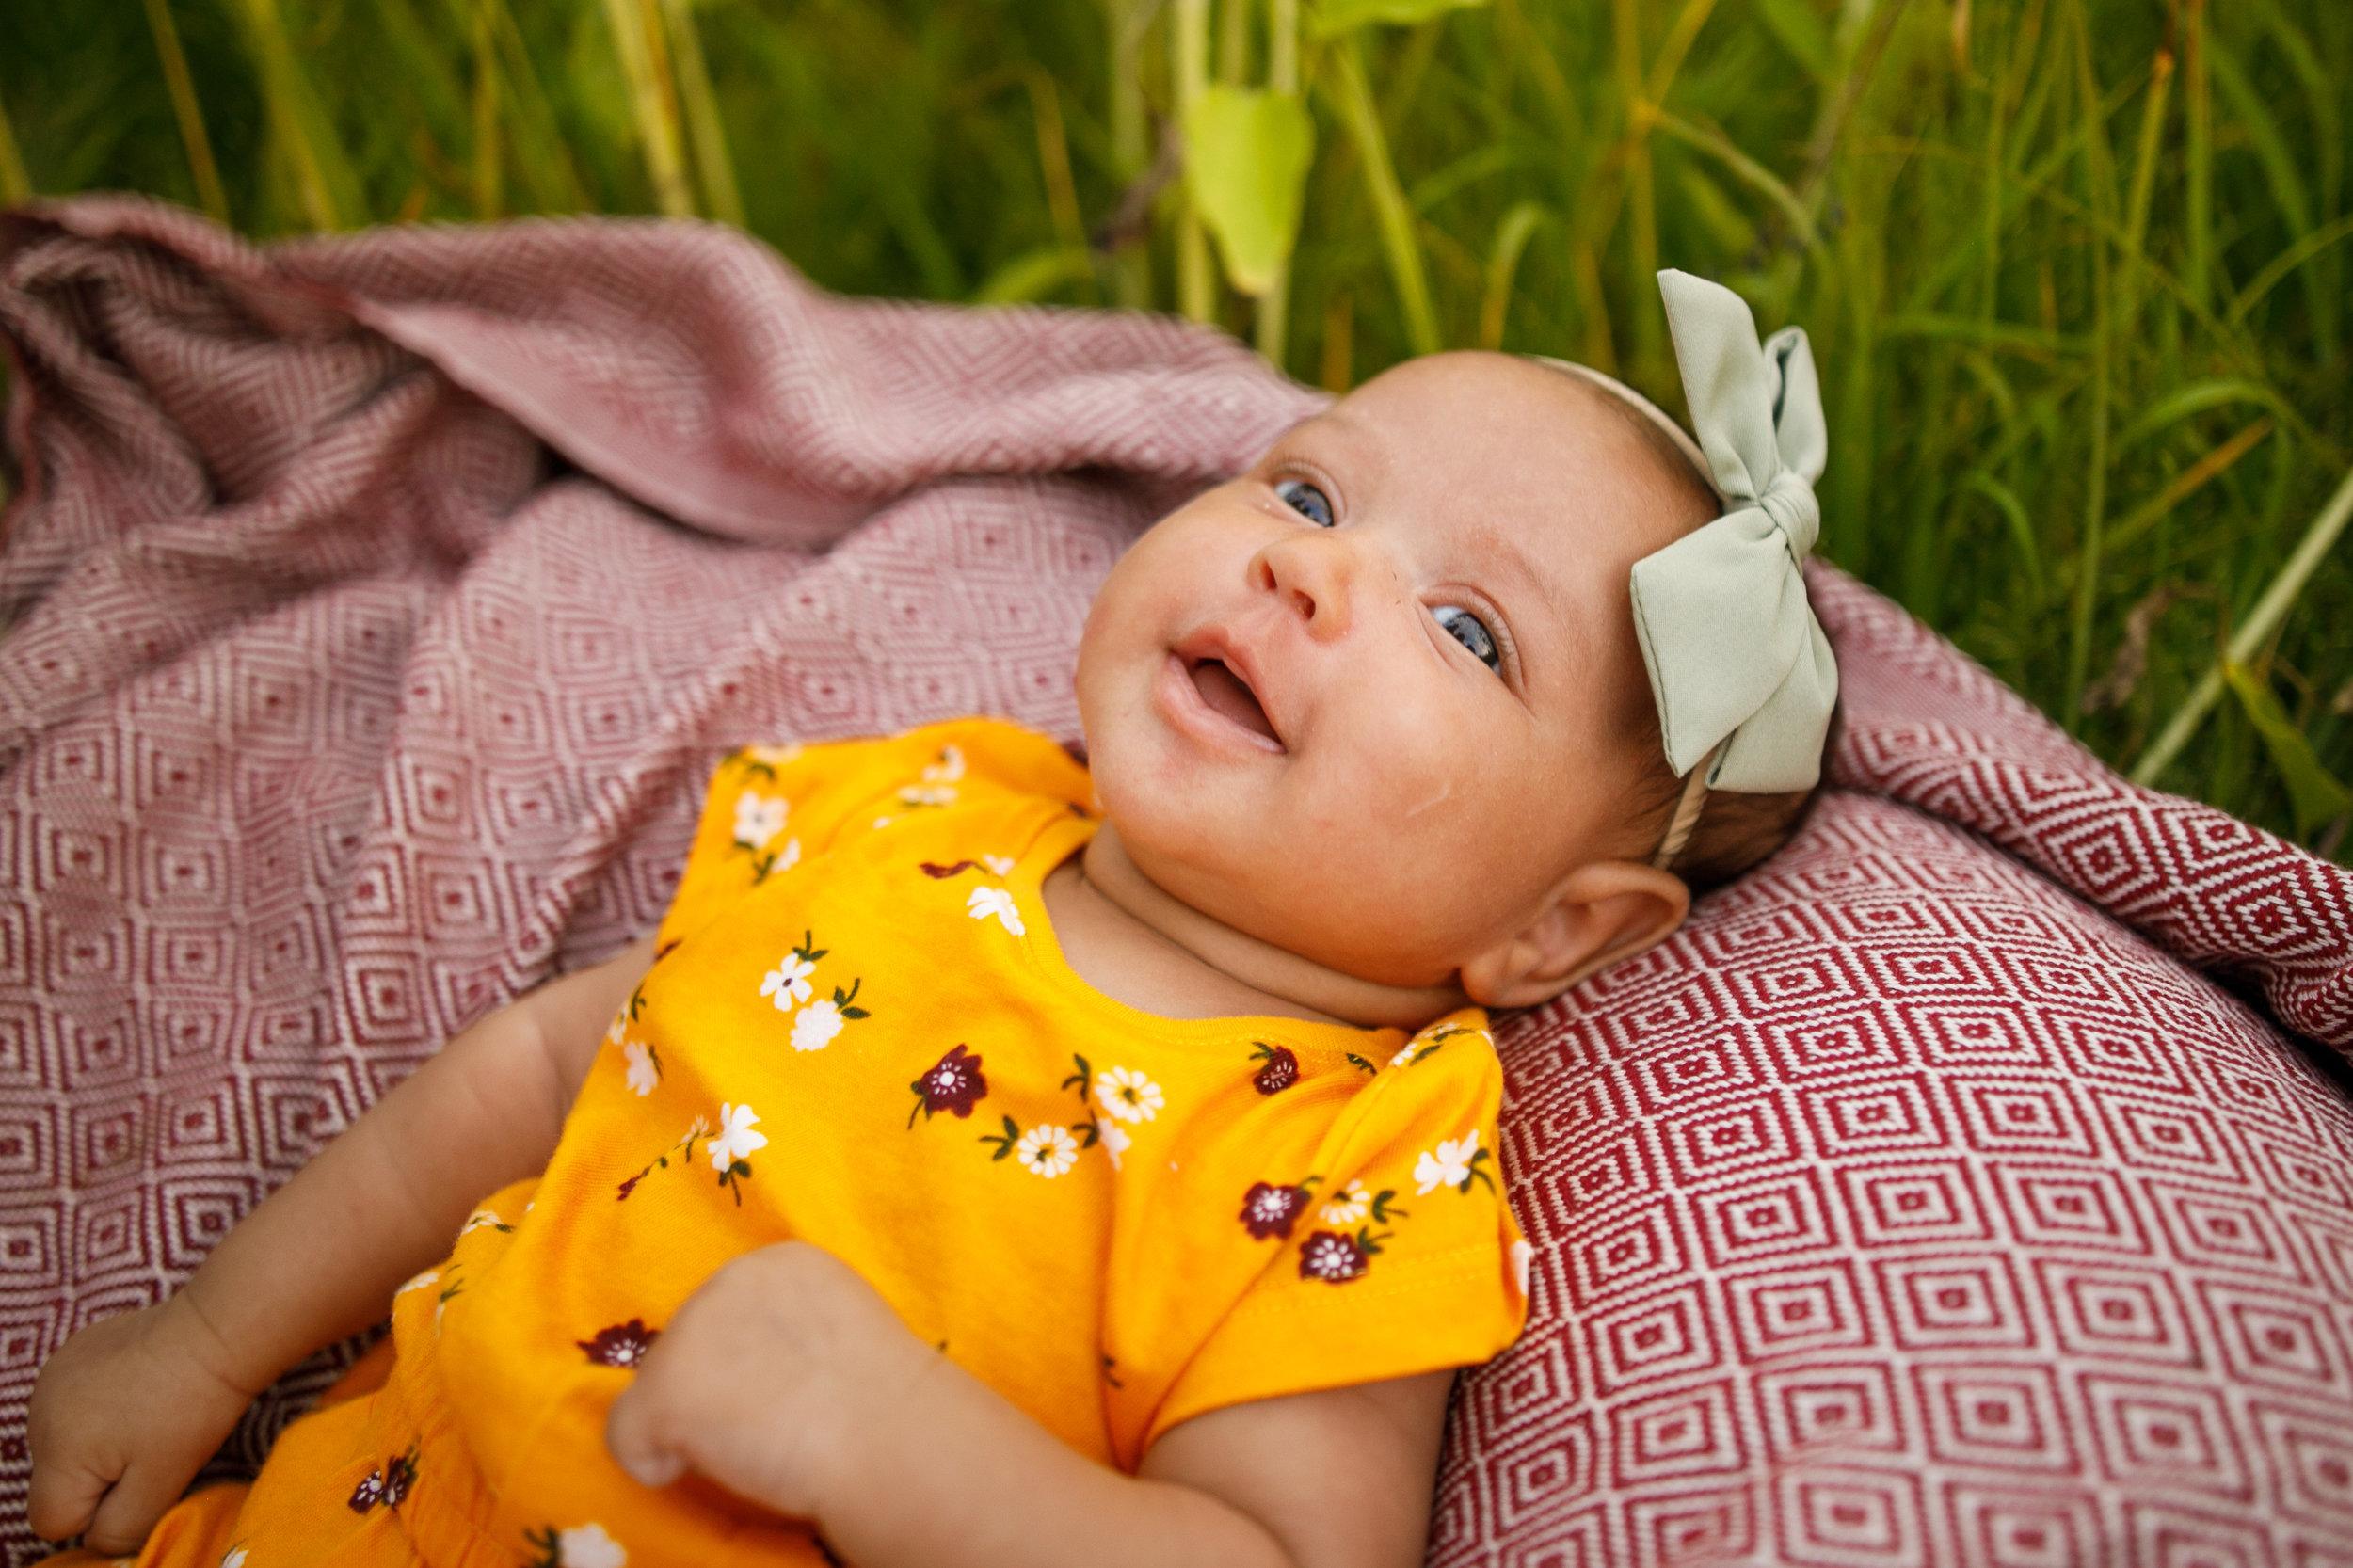 Morris Family Summer 2019 - Grand Rapids Photographer - Grand Rapids Family Photographer - Ed Dunneback and Girls - J Darling Photo 035.jpg